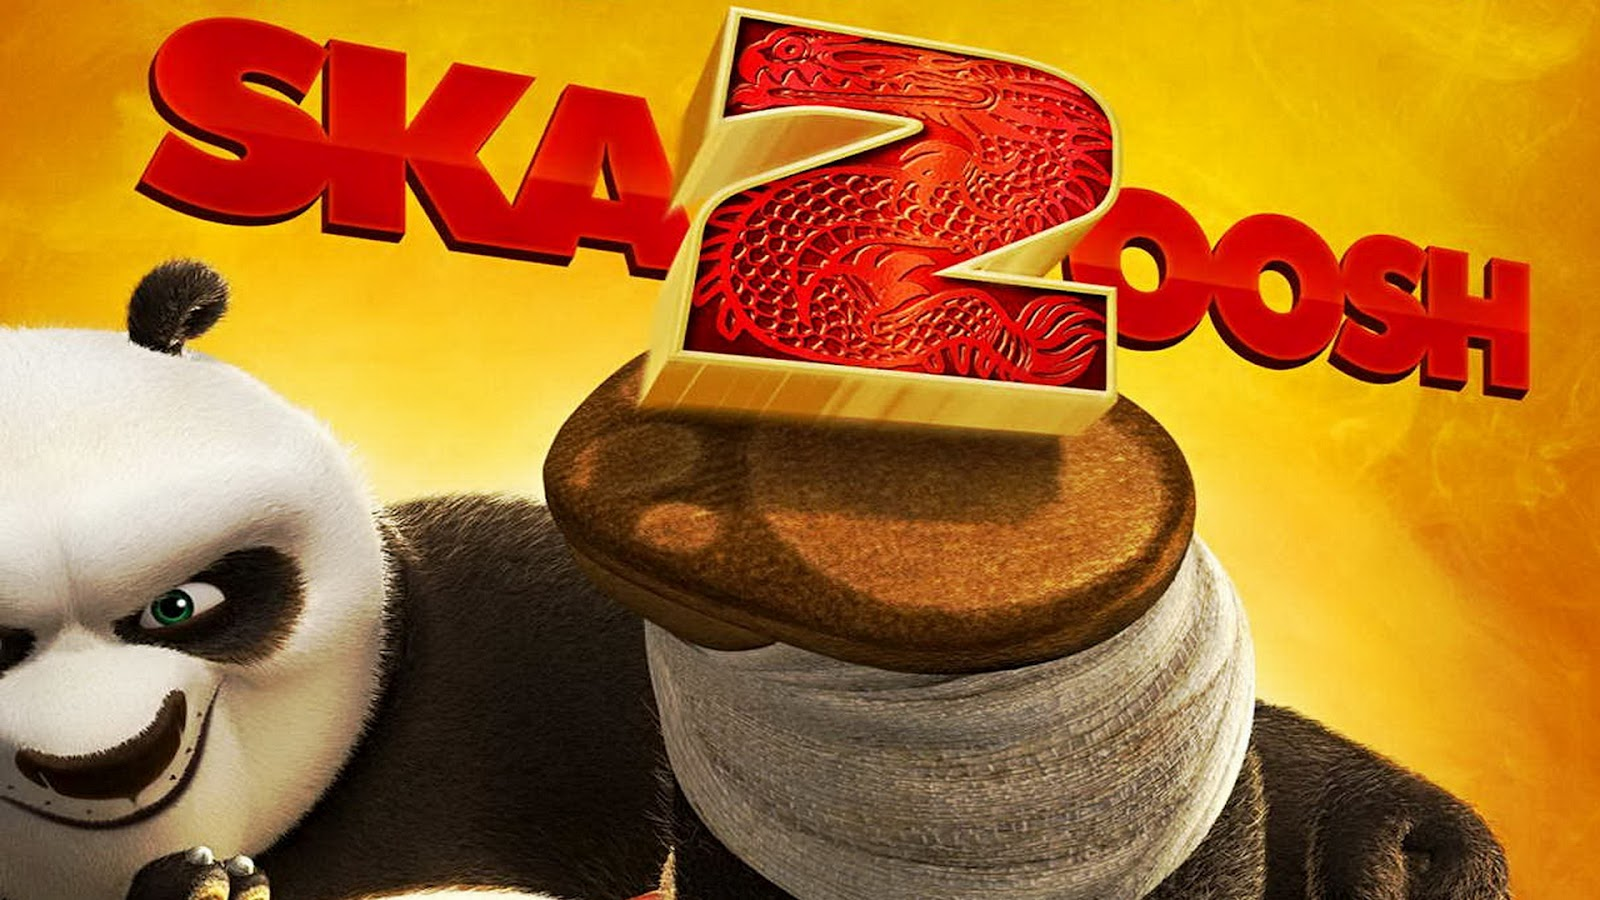 http://3.bp.blogspot.com/-WlarAwOGLsM/UBH80ZgnXqI/AAAAAAAAC6I/jhvzBQg1_A4/s1600/Kung-Fu-Panda-2-Wallpaper.jpg